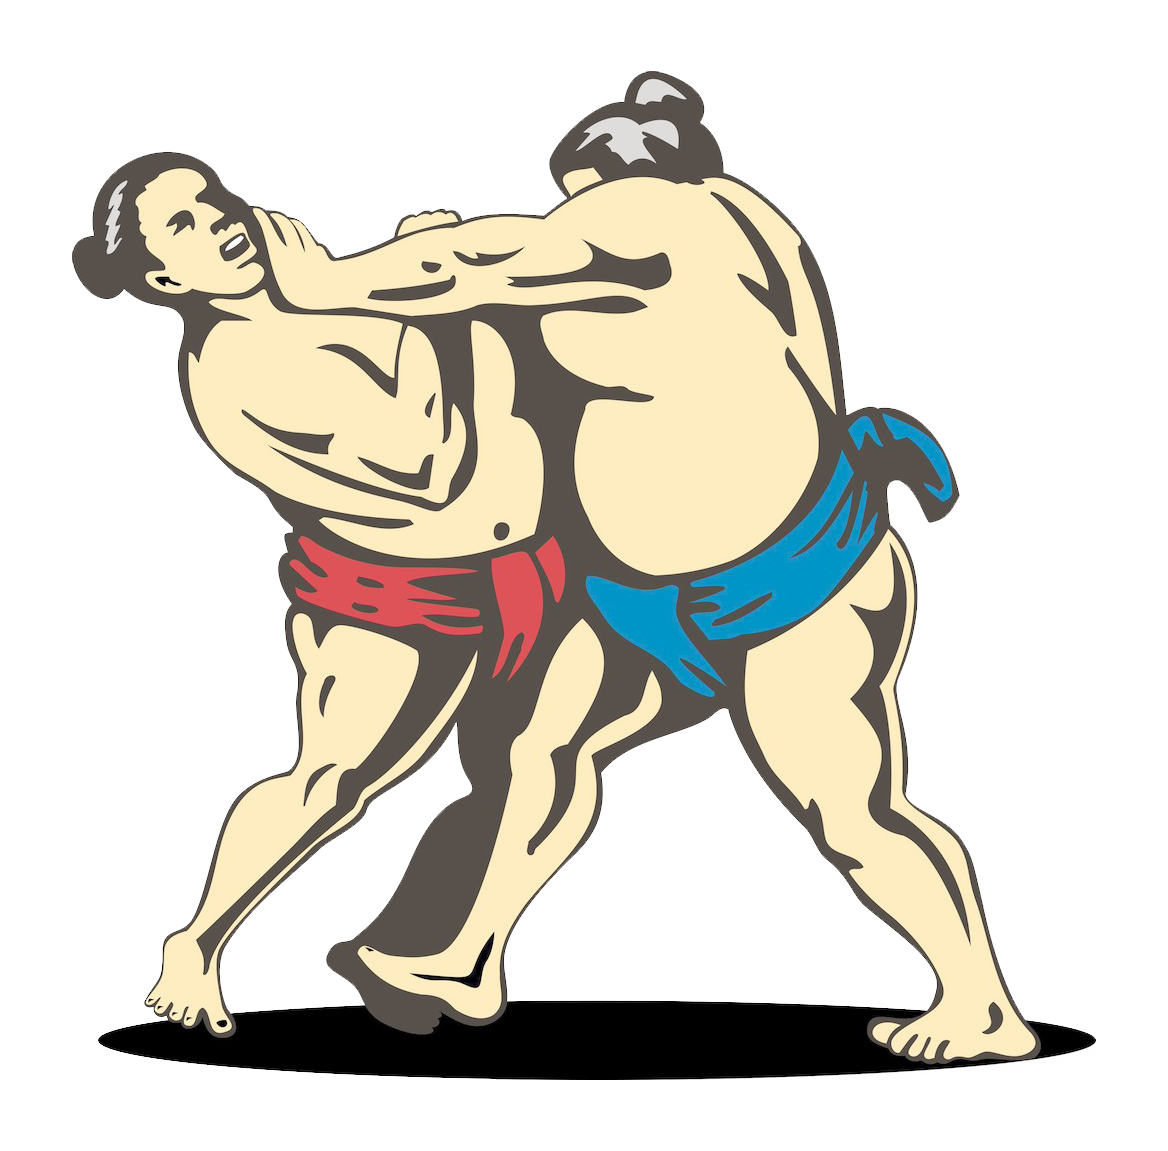 Wrestlers clipart combat. Sumo wrestling stock illustration